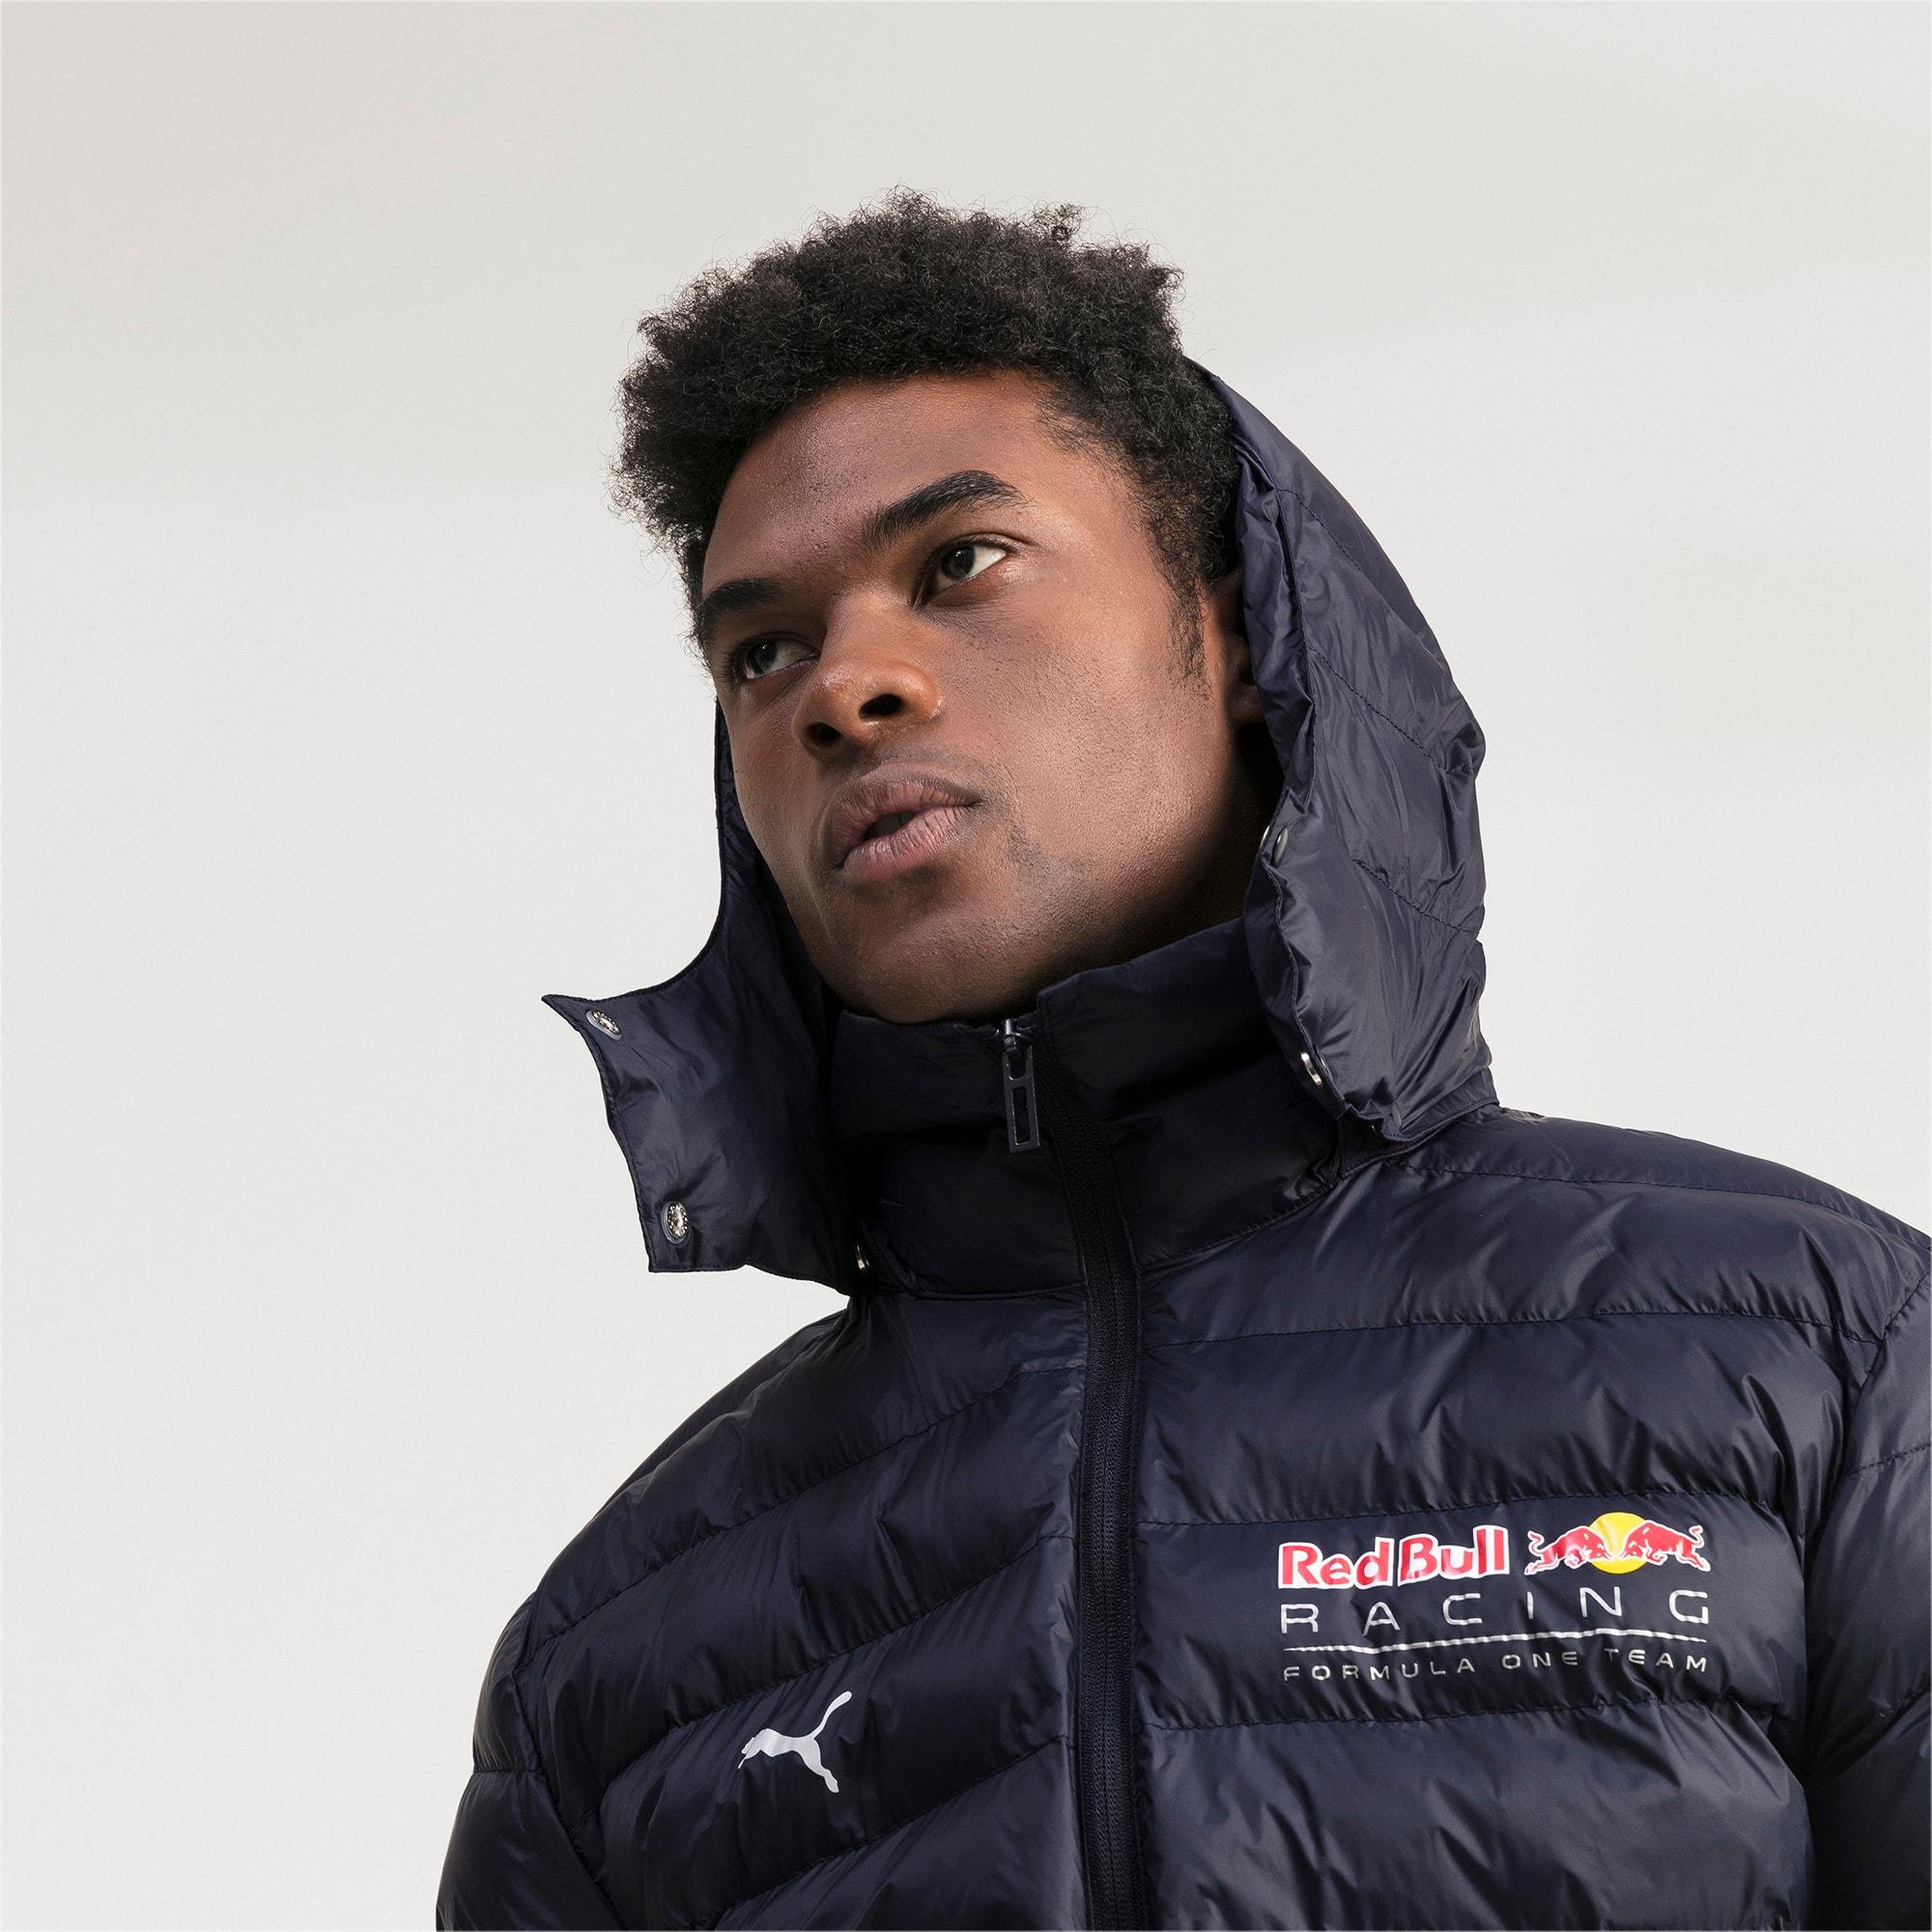 Thumbnail 4 of Red Bull Racing Eco PackLite Herren Daunenjacke, NIGHT SKY, medium